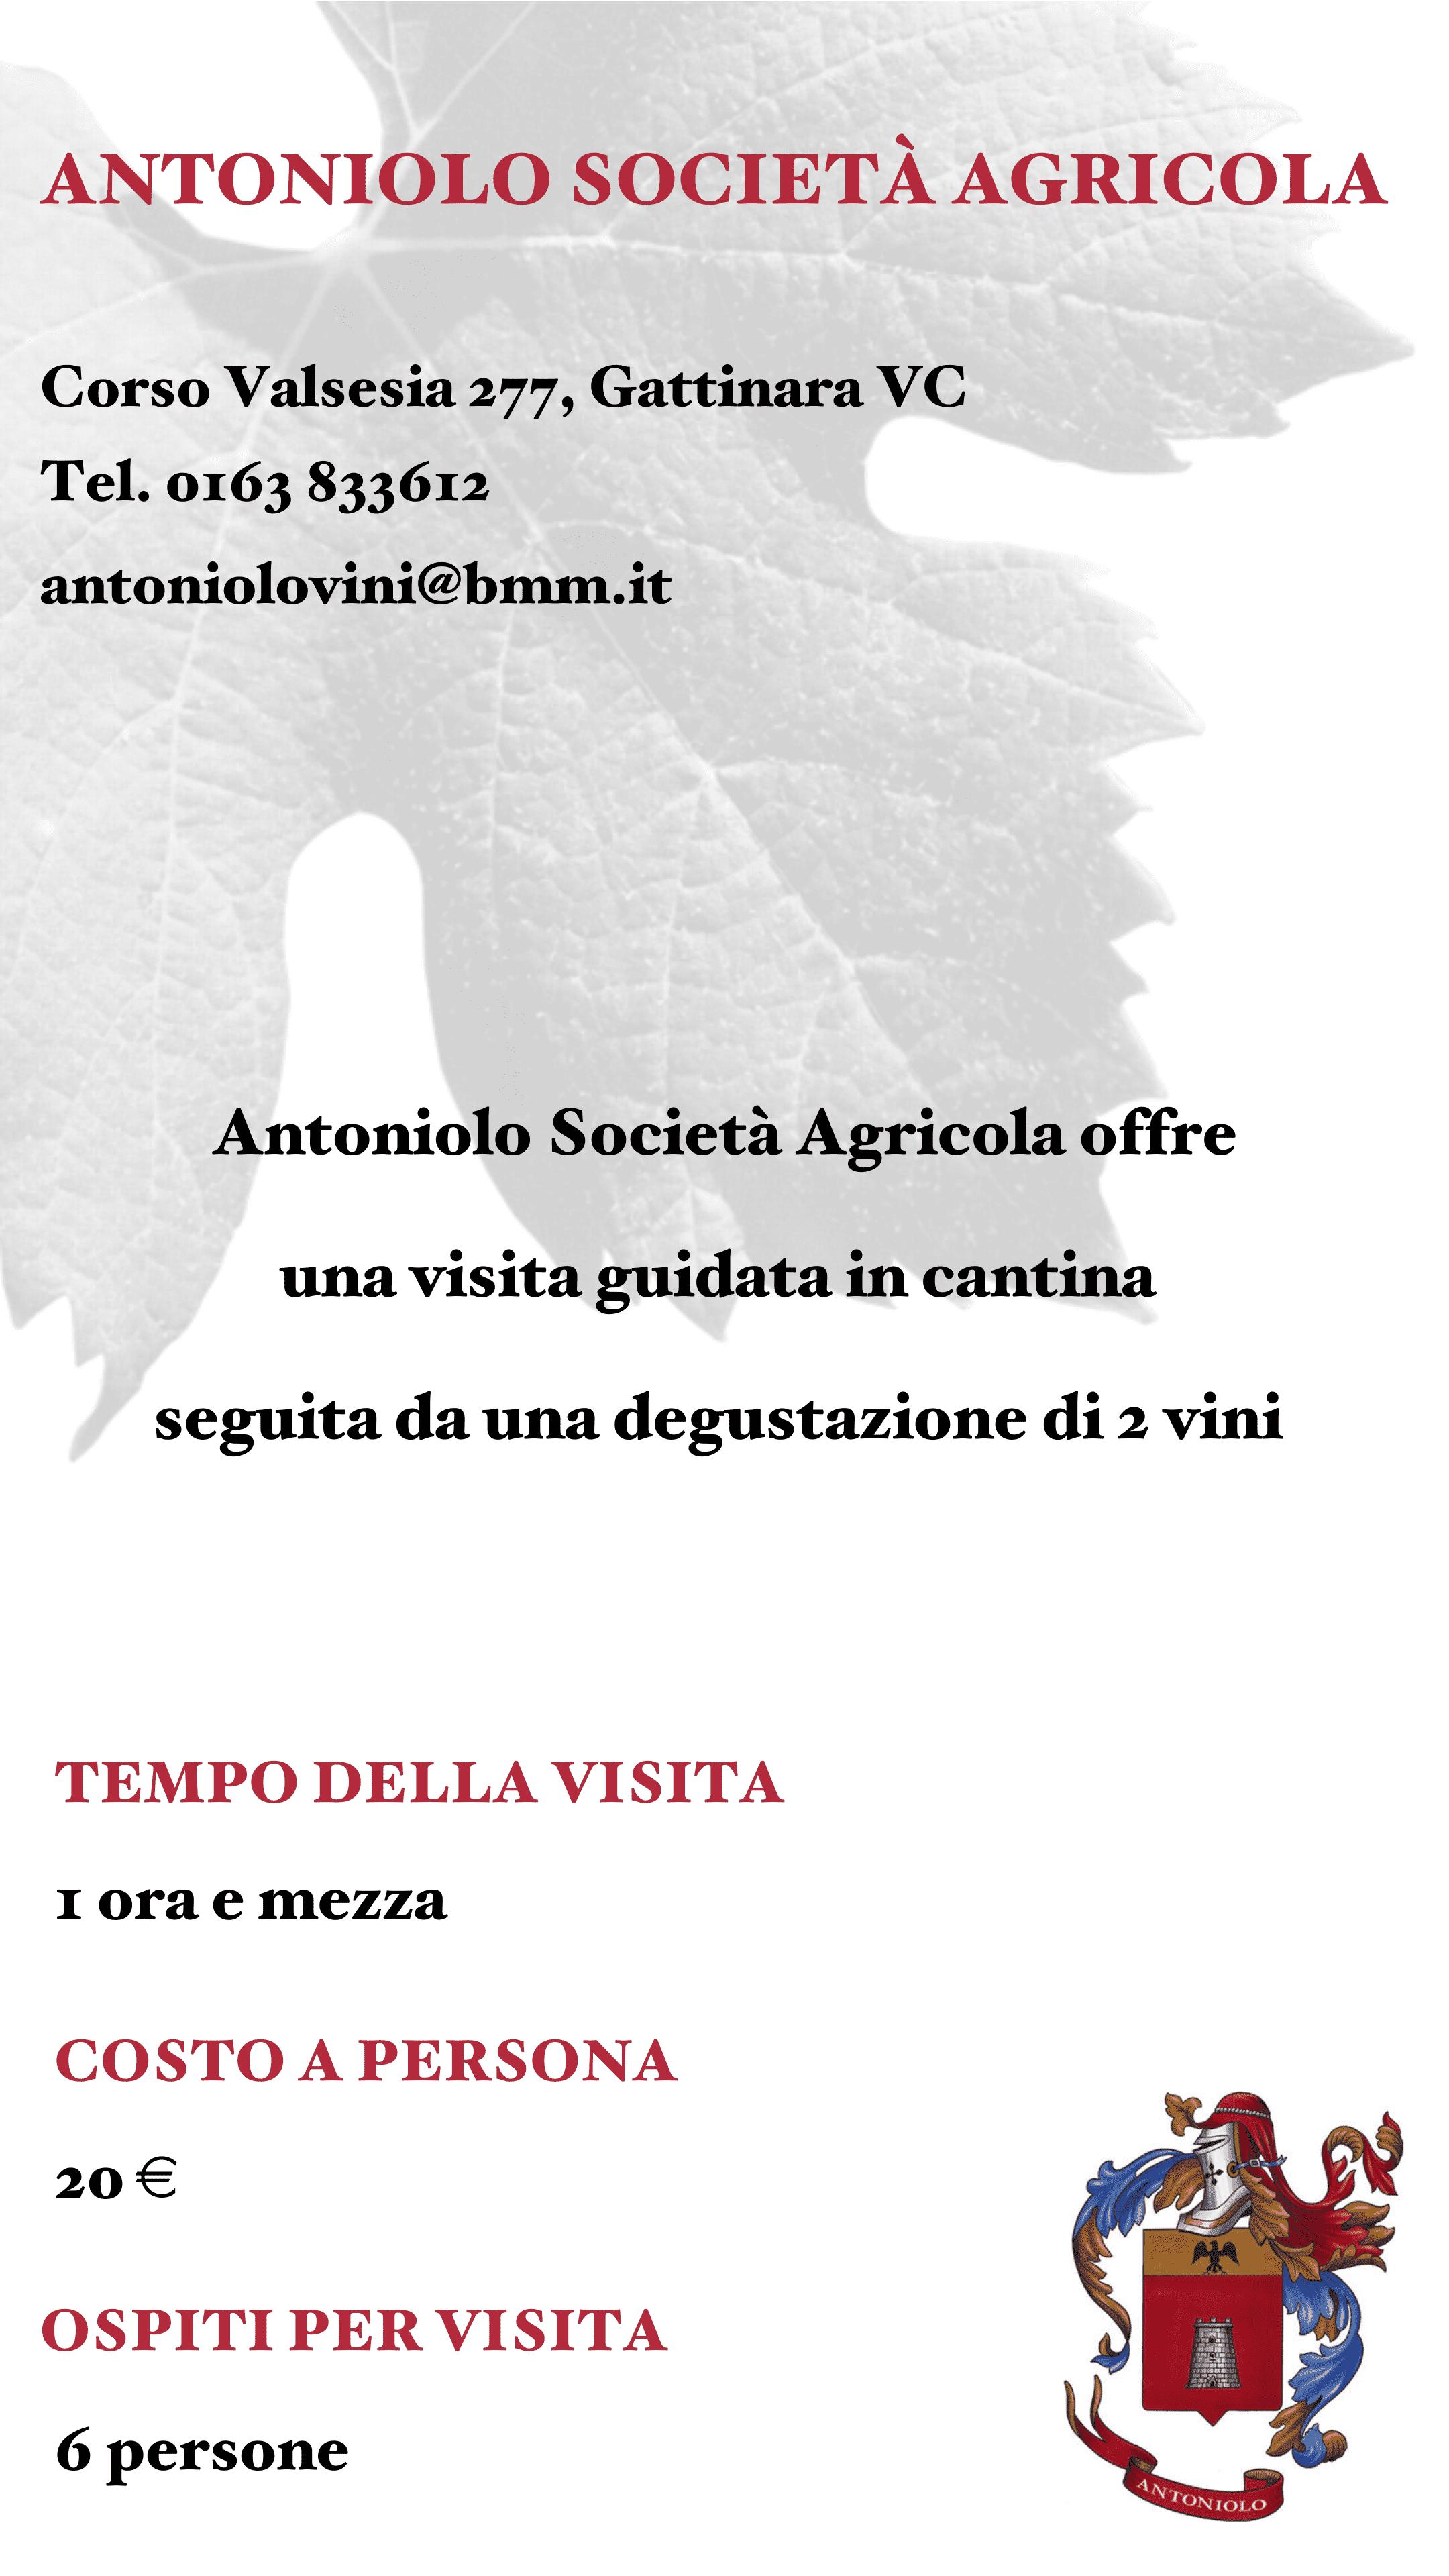 Antoniolo società agricola